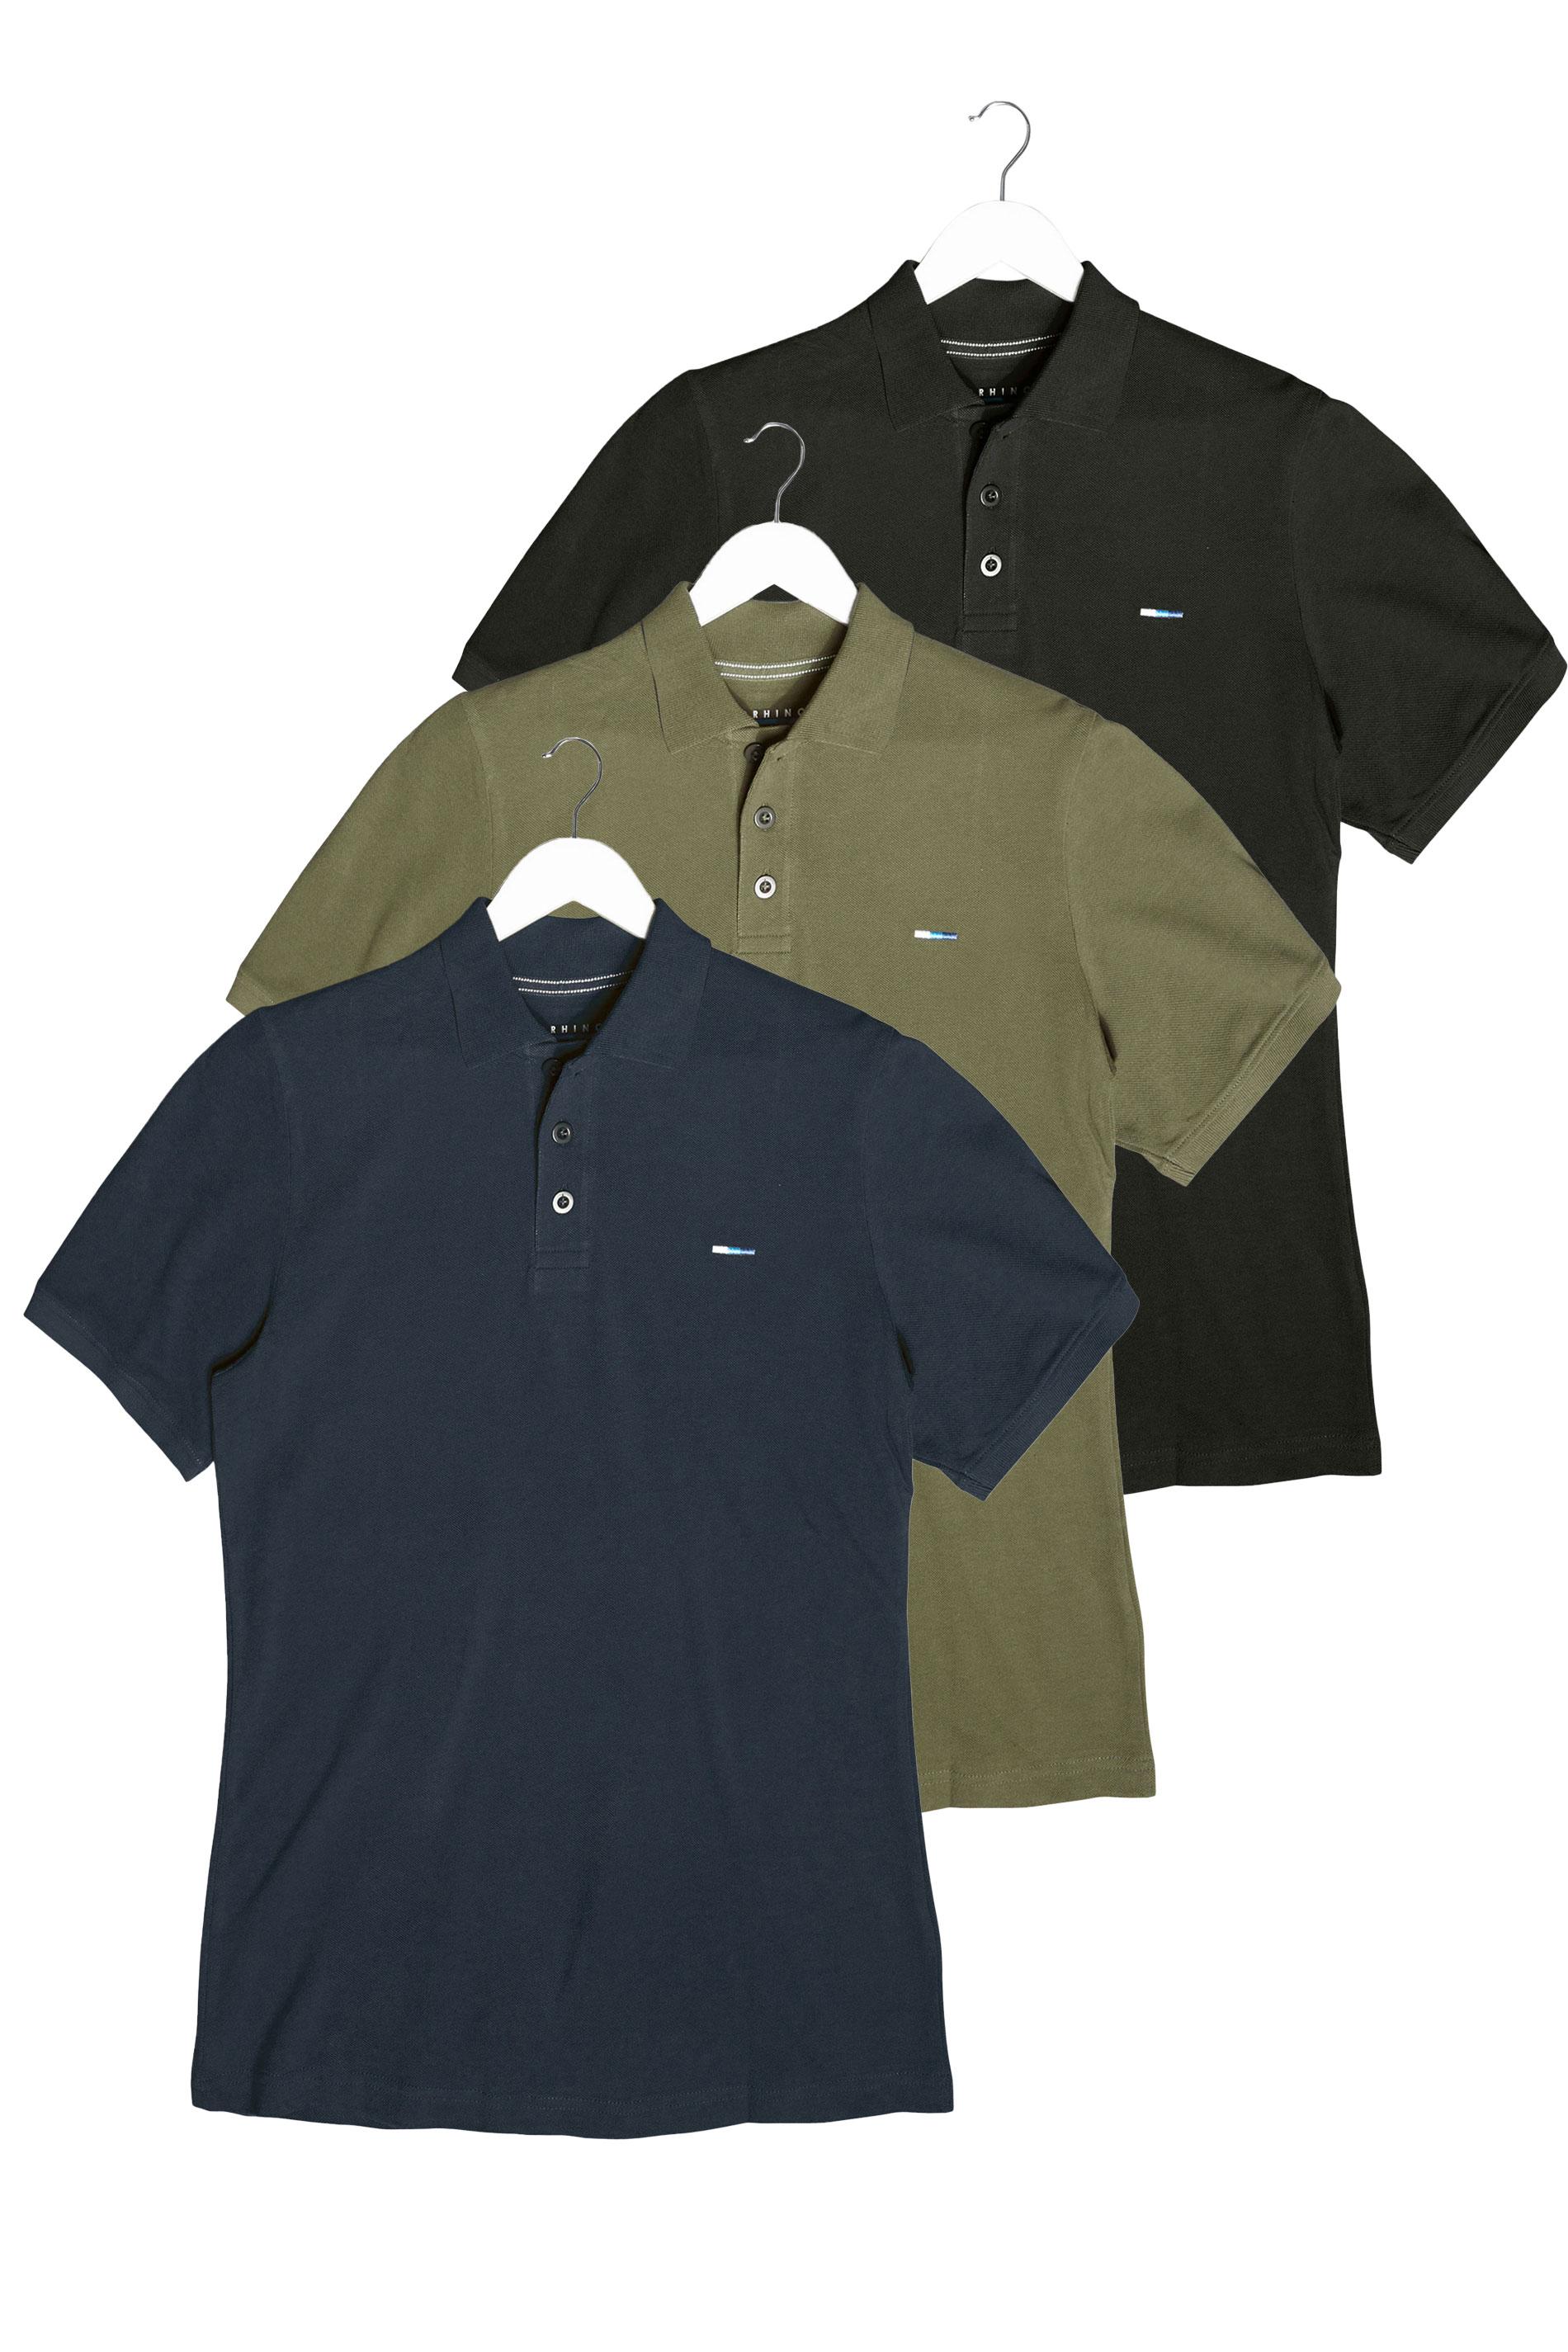 BadRhino Multi 3 Pack Plain Polo Shirts_A.jpg